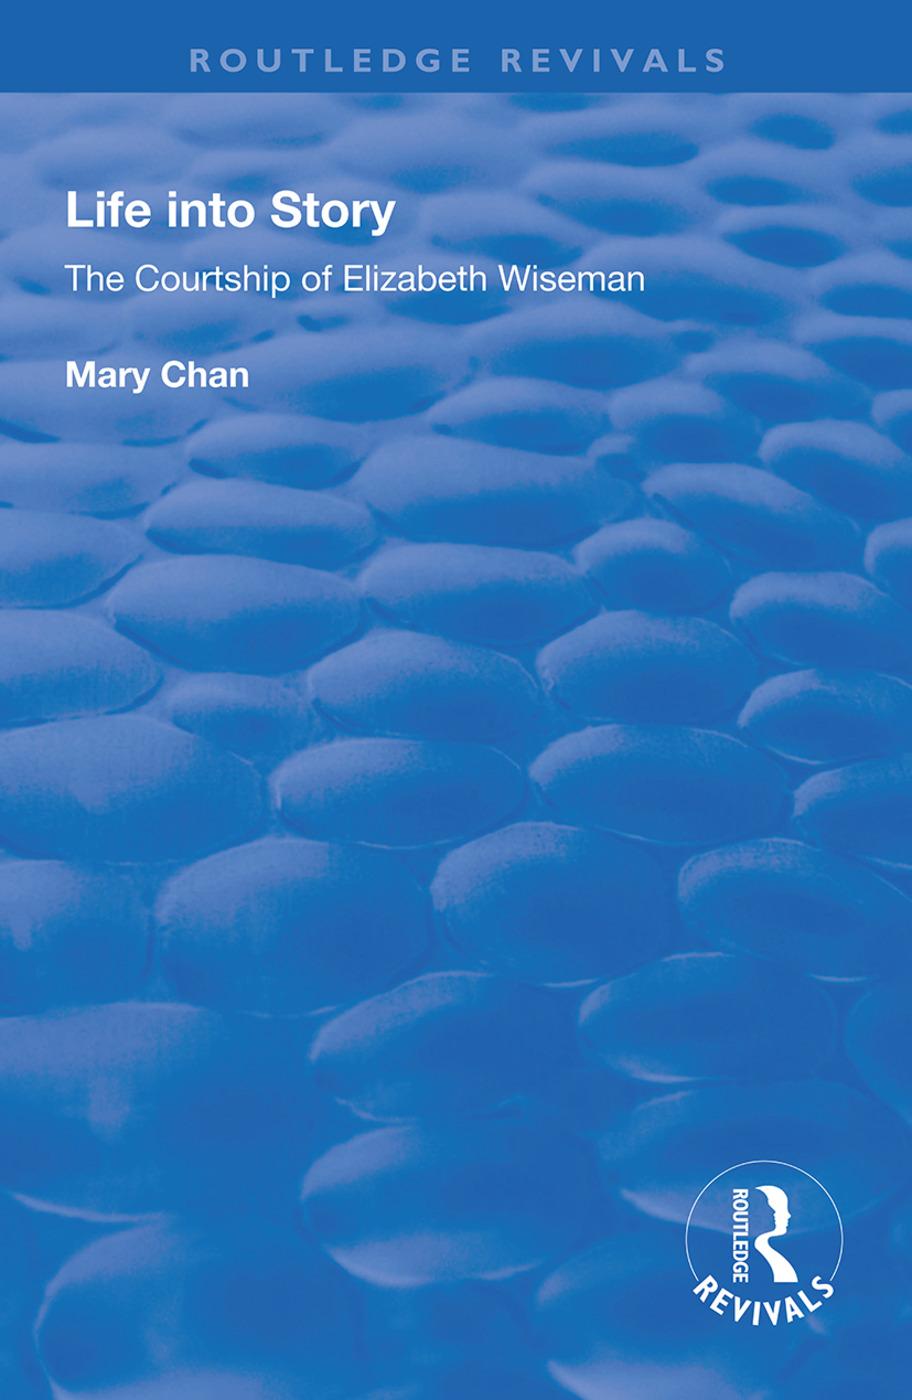 Life into Story: Courtship of Elizabeth Wiseman book cover